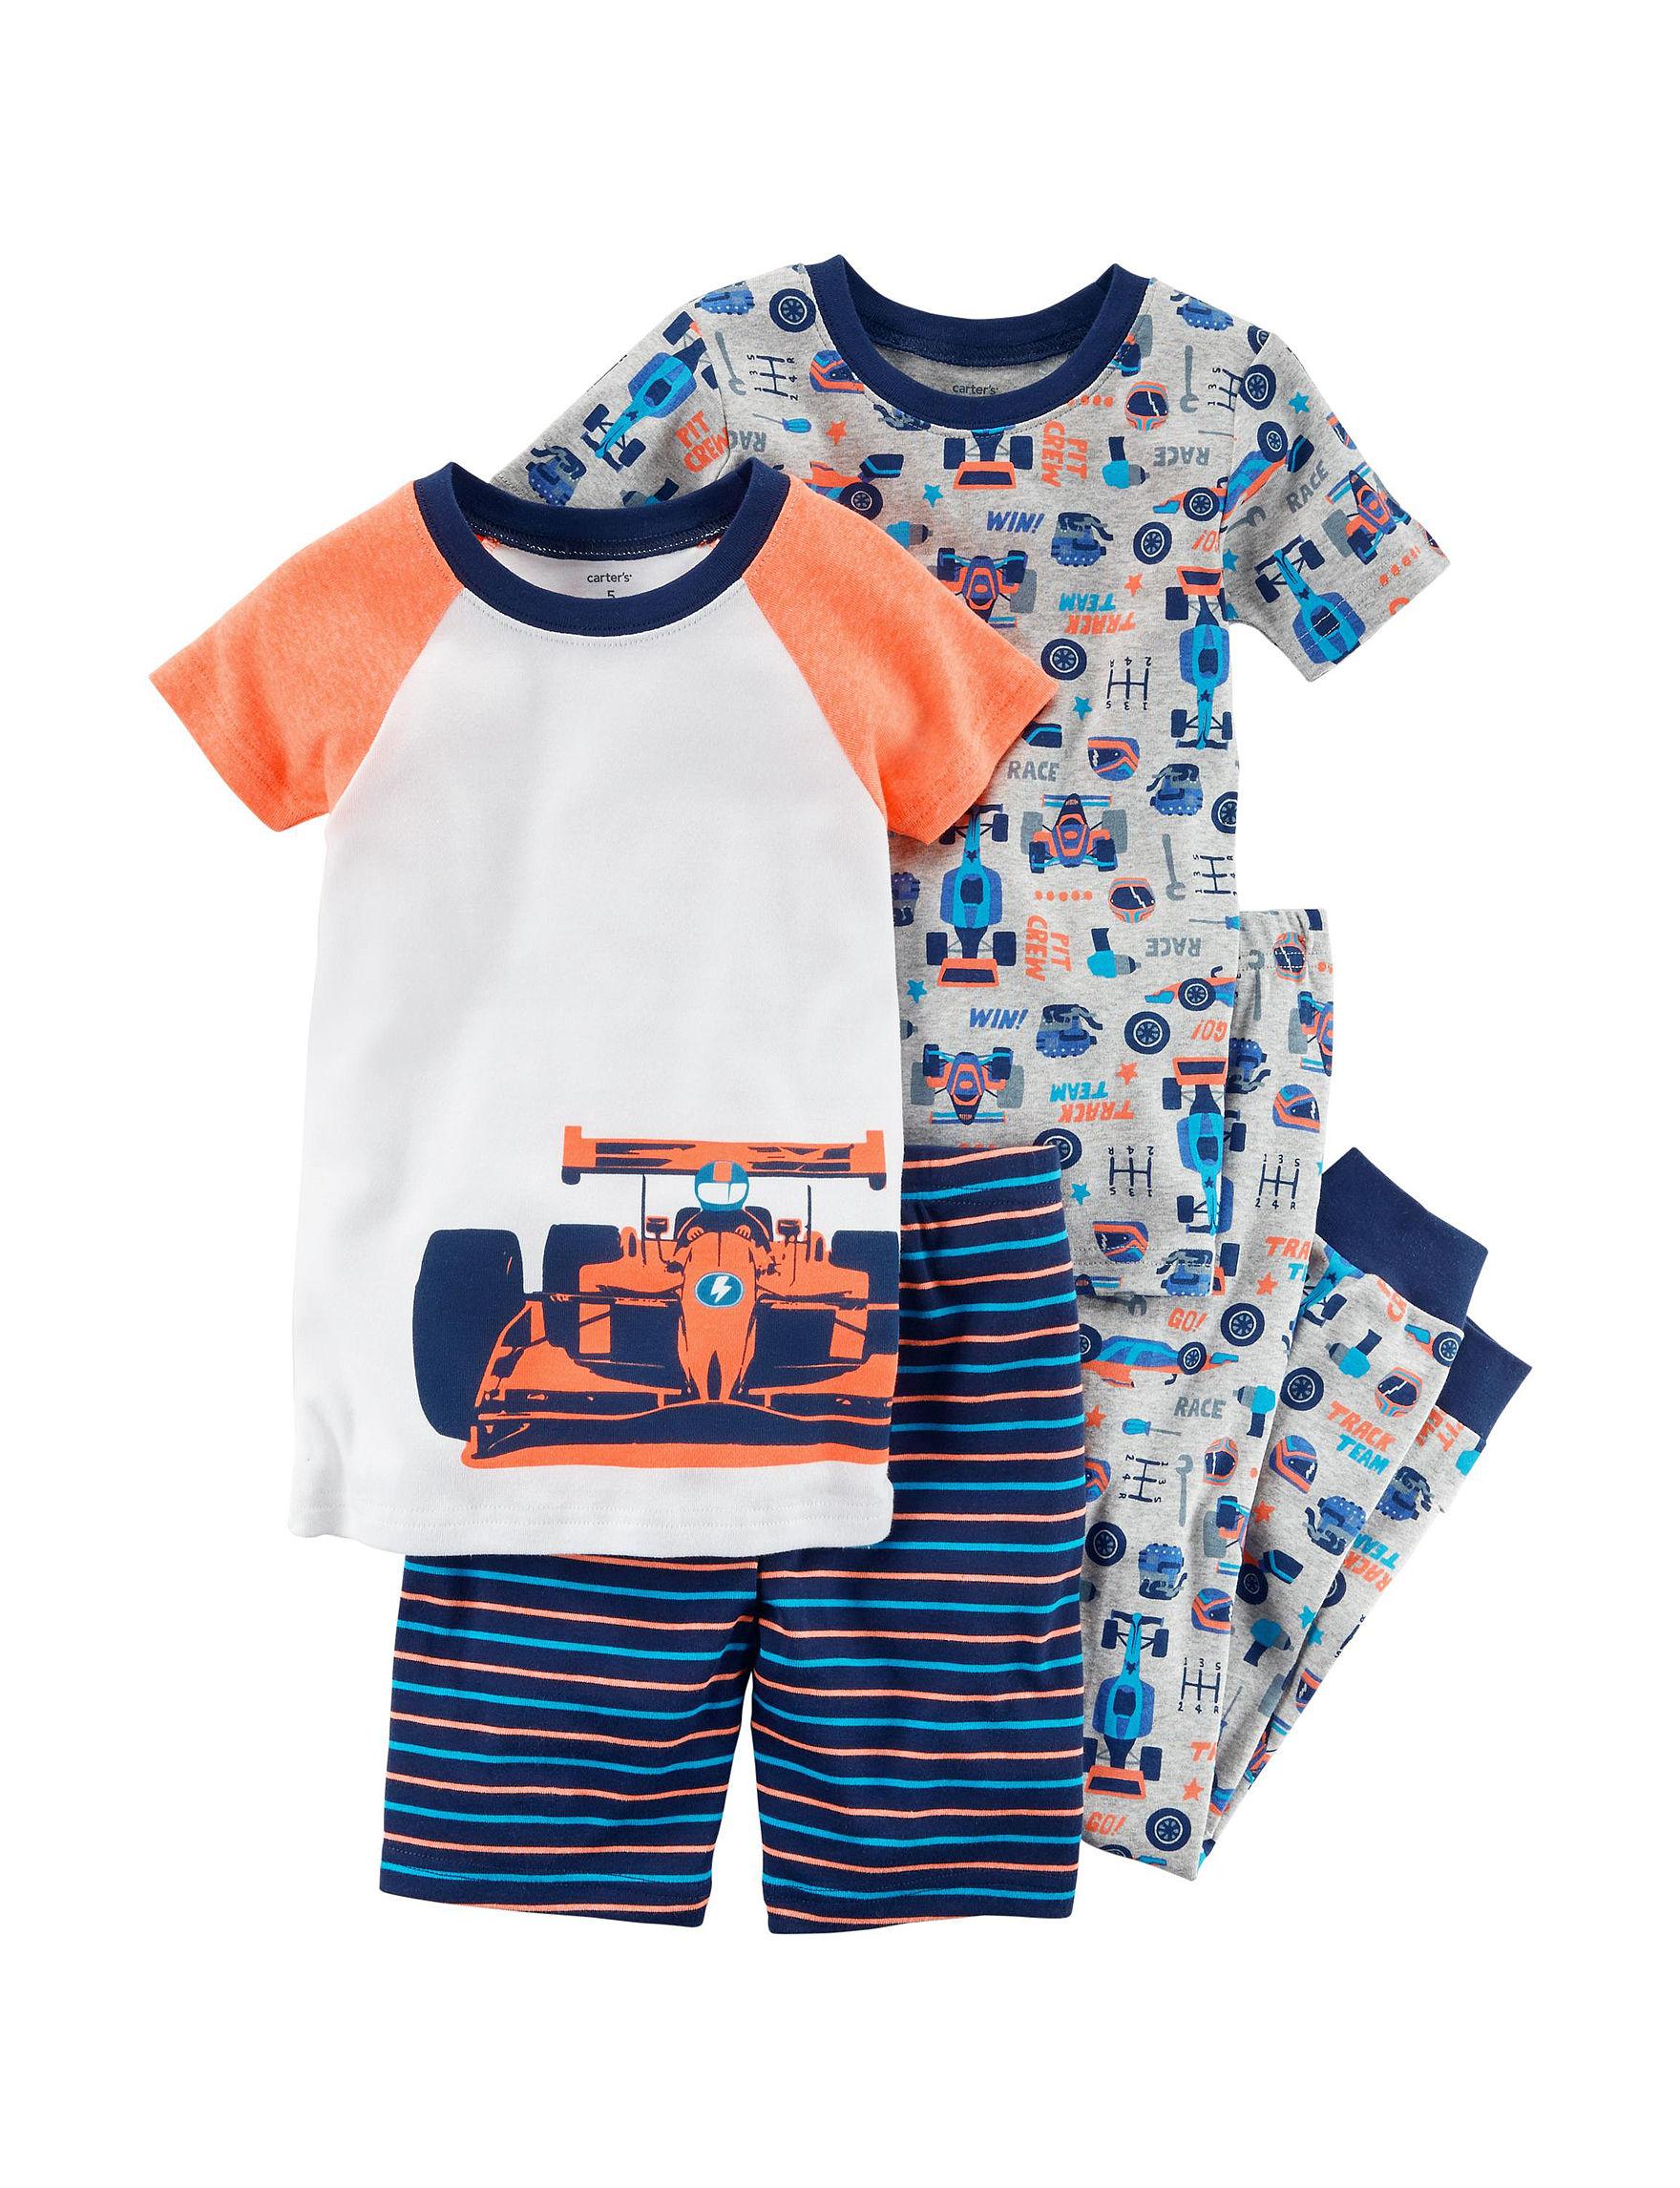 Carter's Blue / Orange Pajama Sets